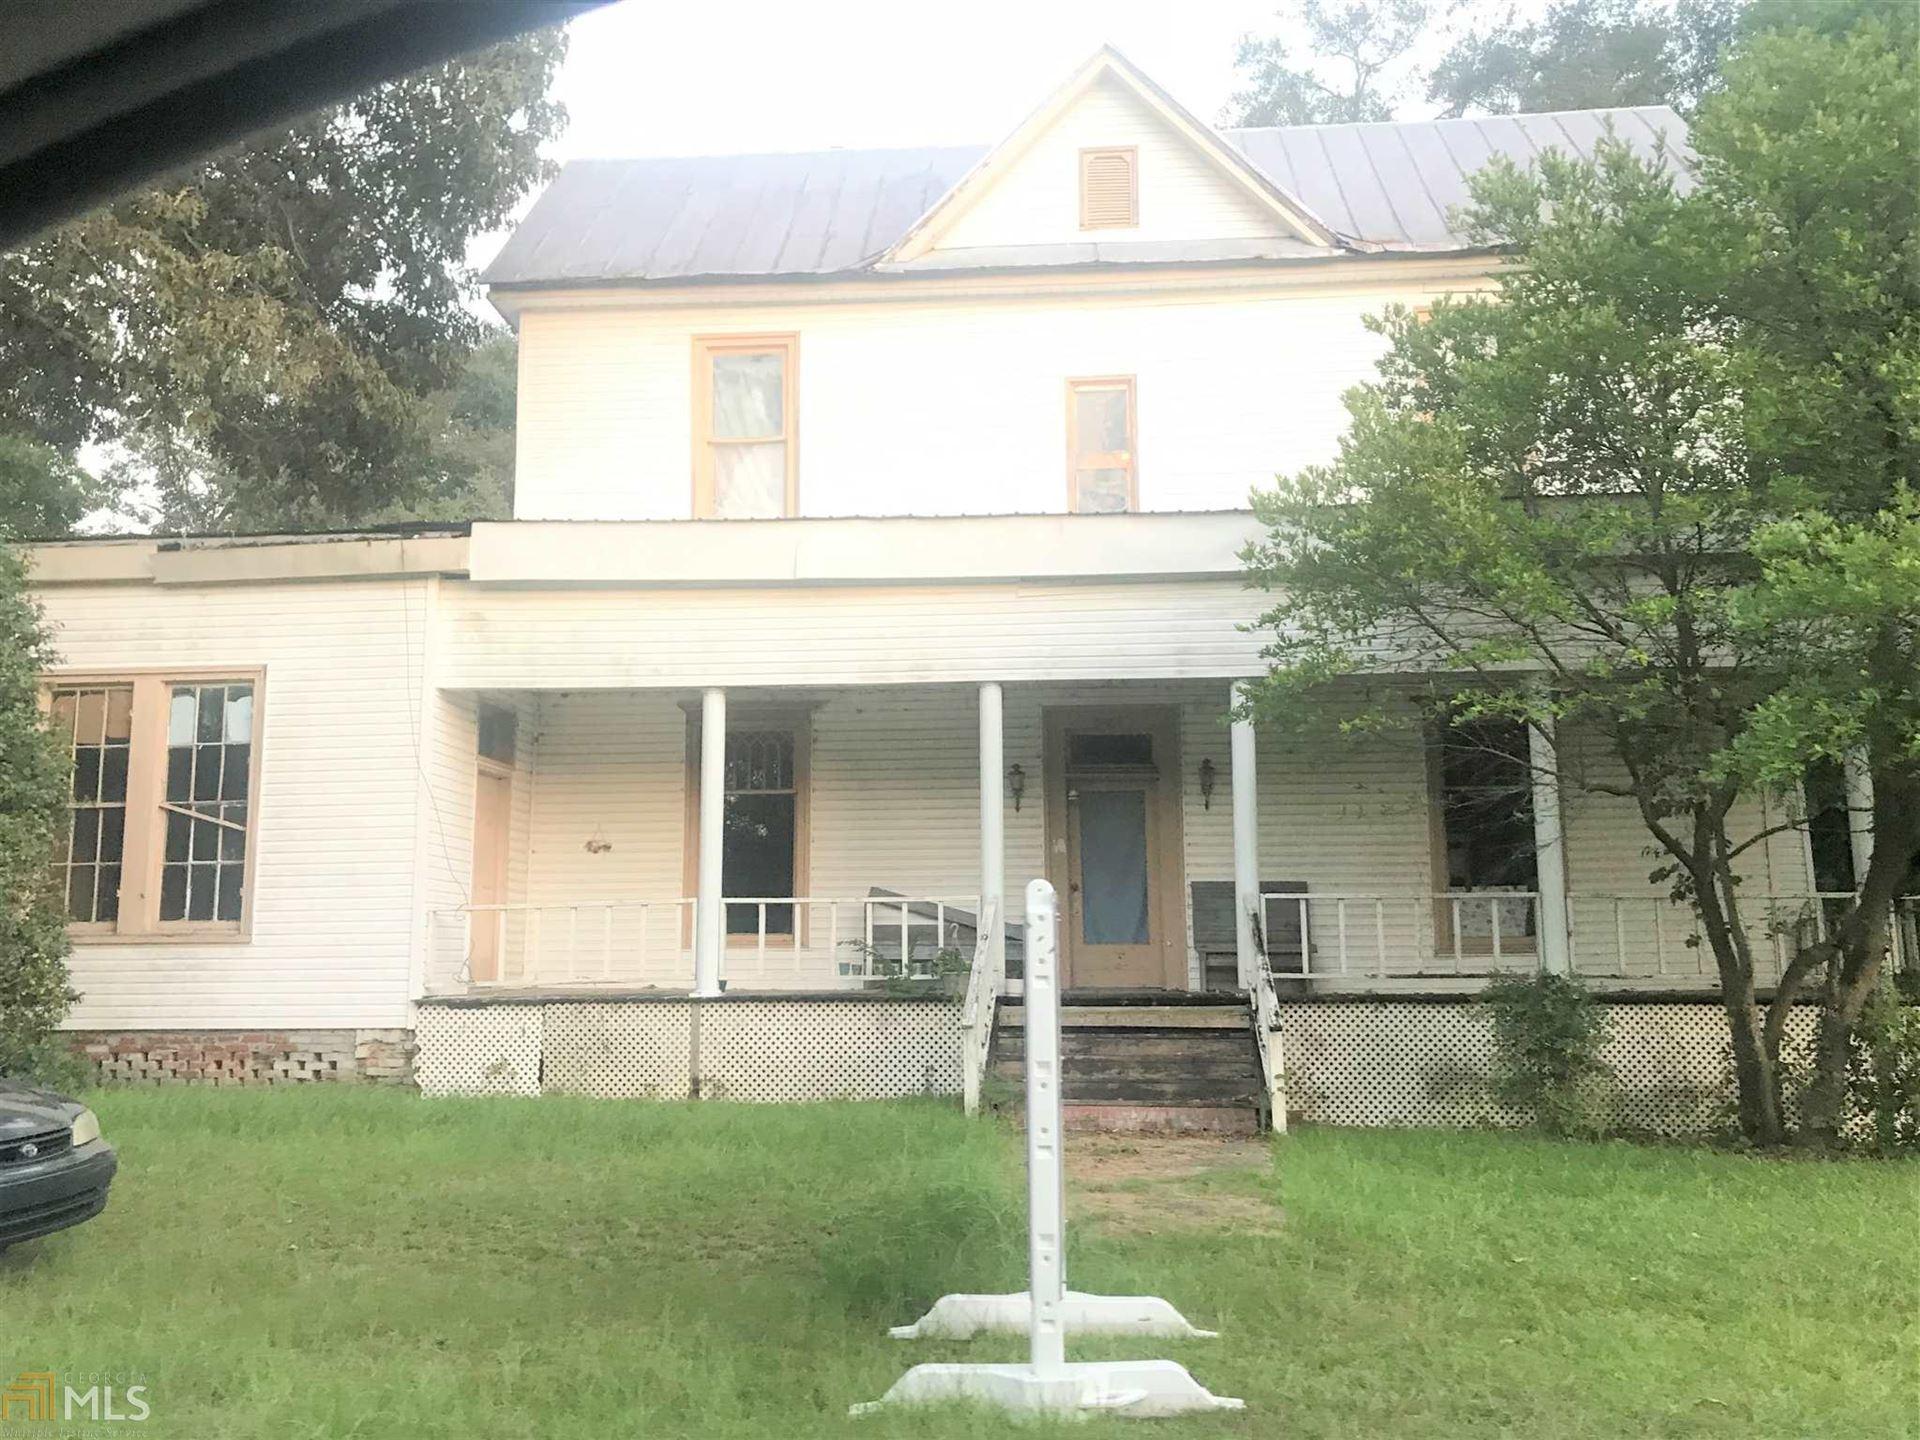 140 E Beech St, Cochran, GA 31014 - MLS#: 8850692